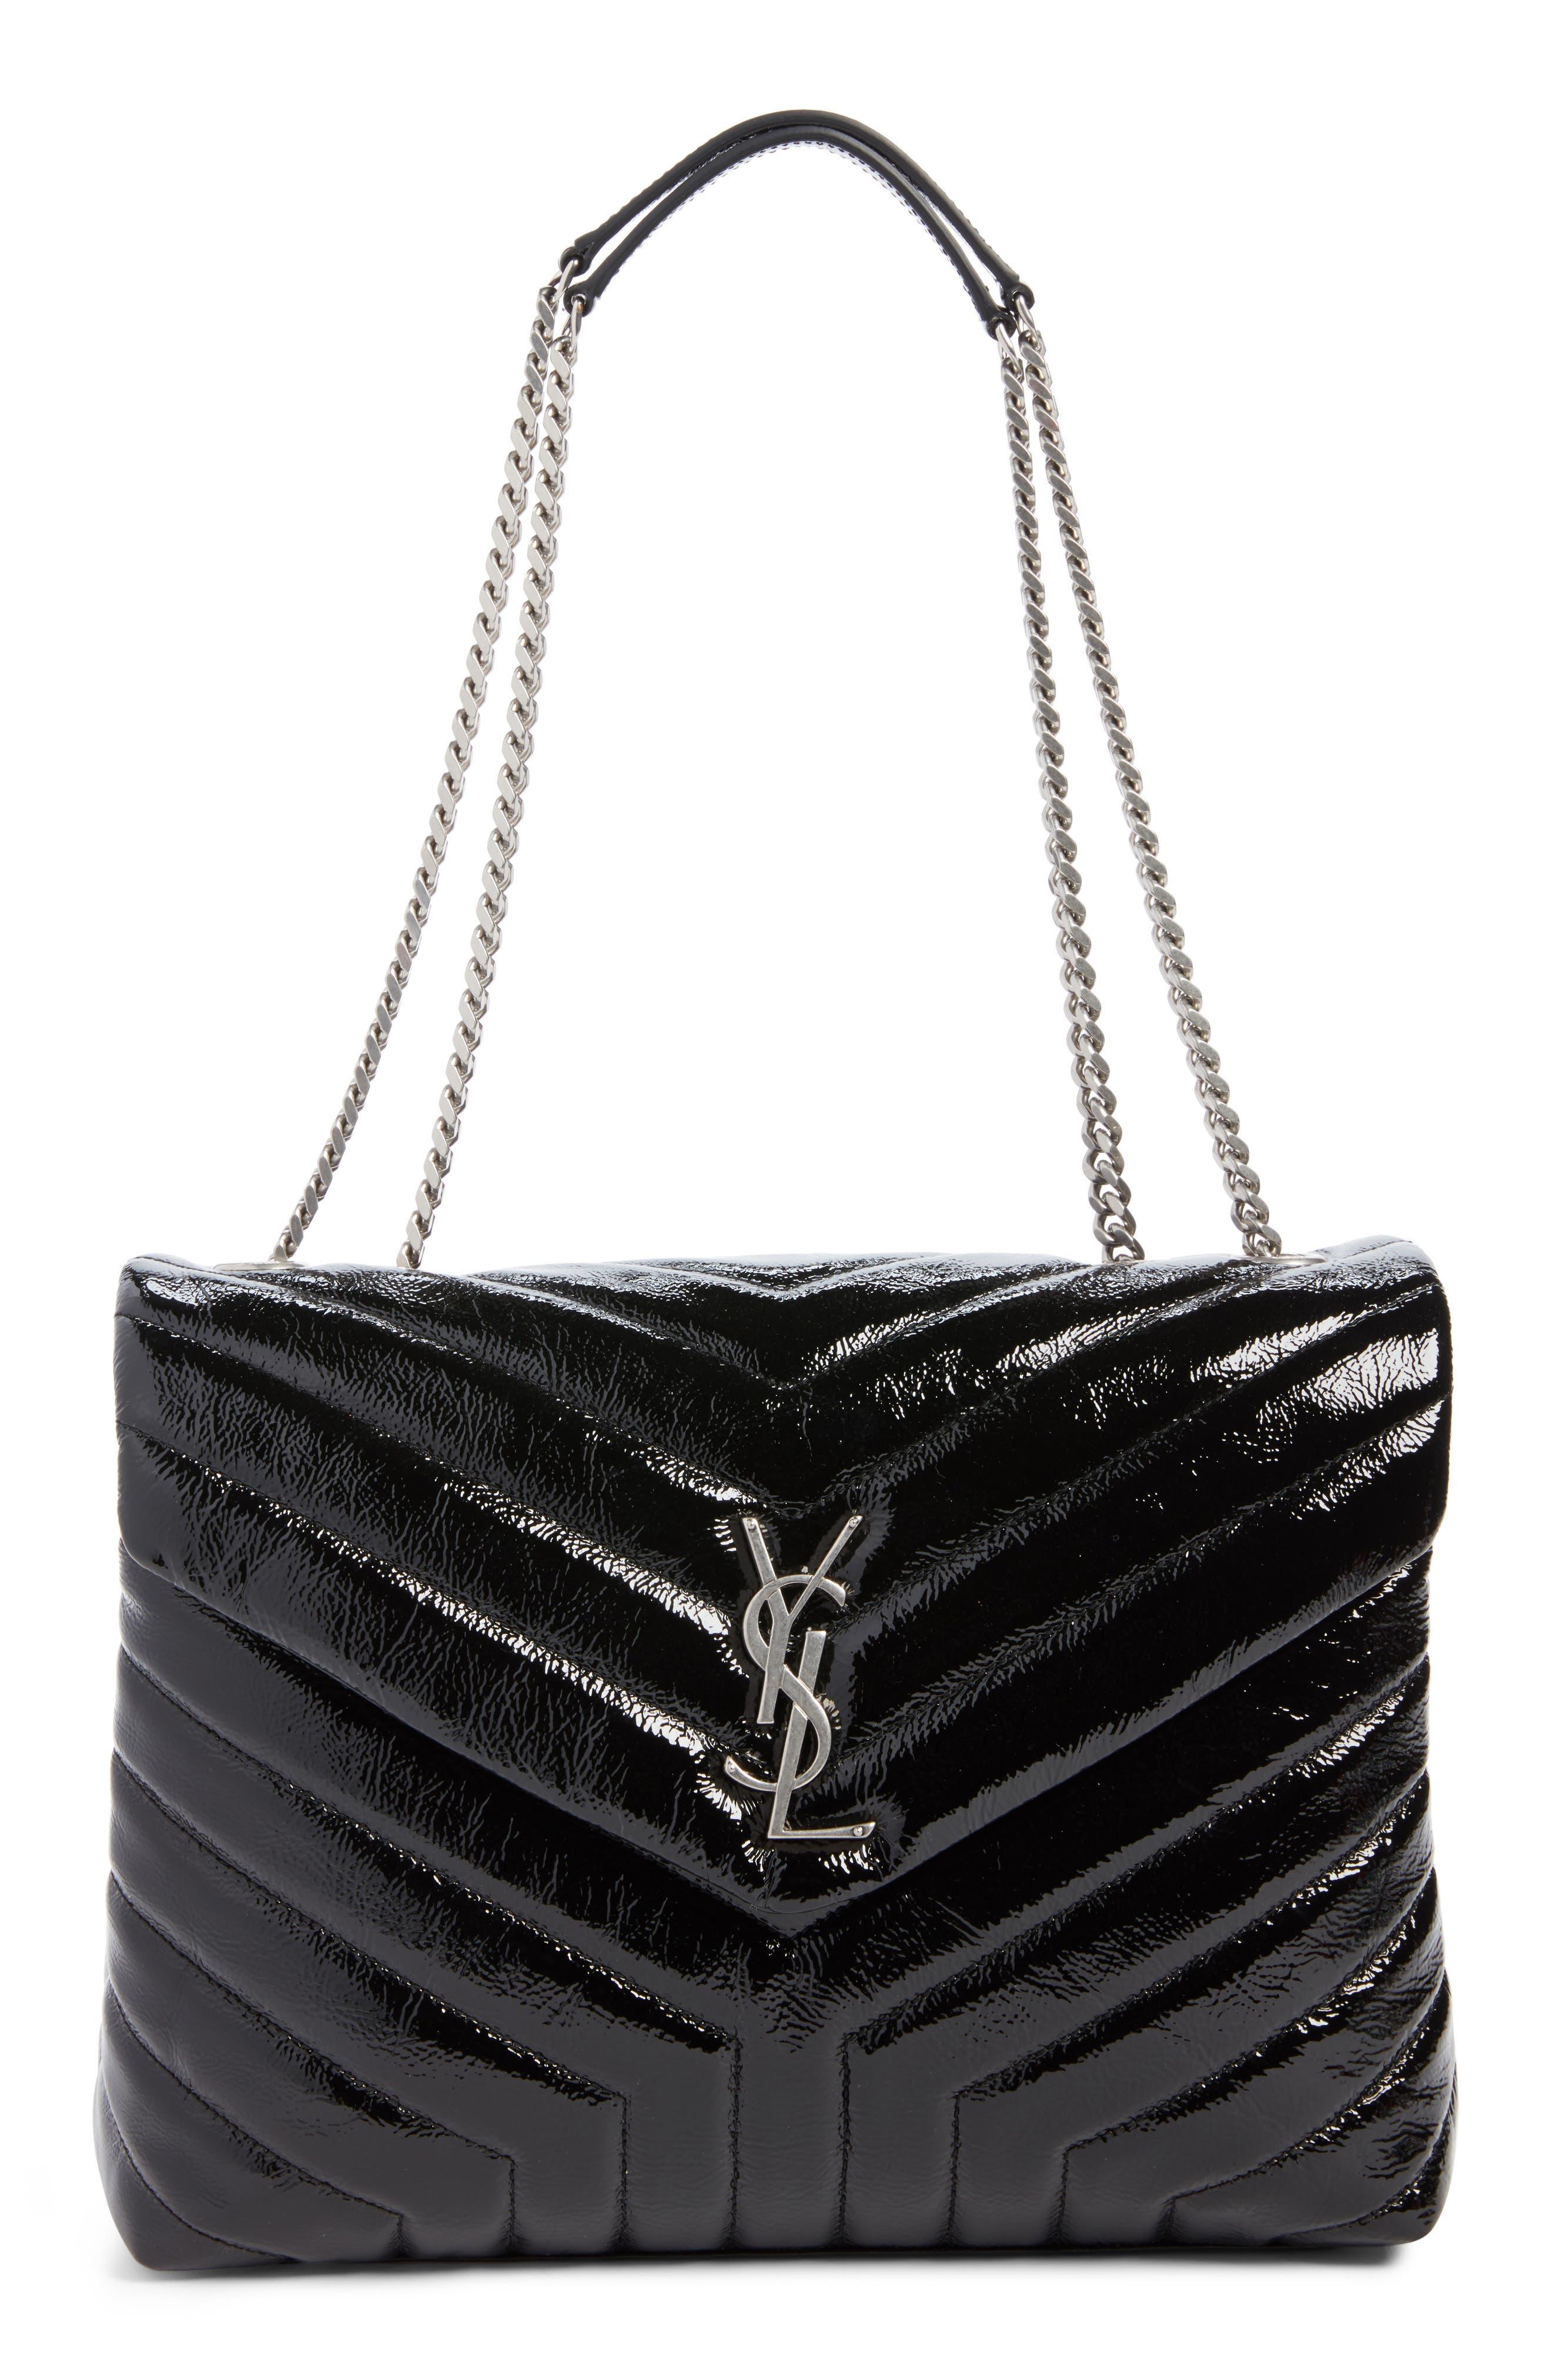 Medium Loulou Patent Leather Shoulder Bag,                             Main thumbnail 1, color,                             001